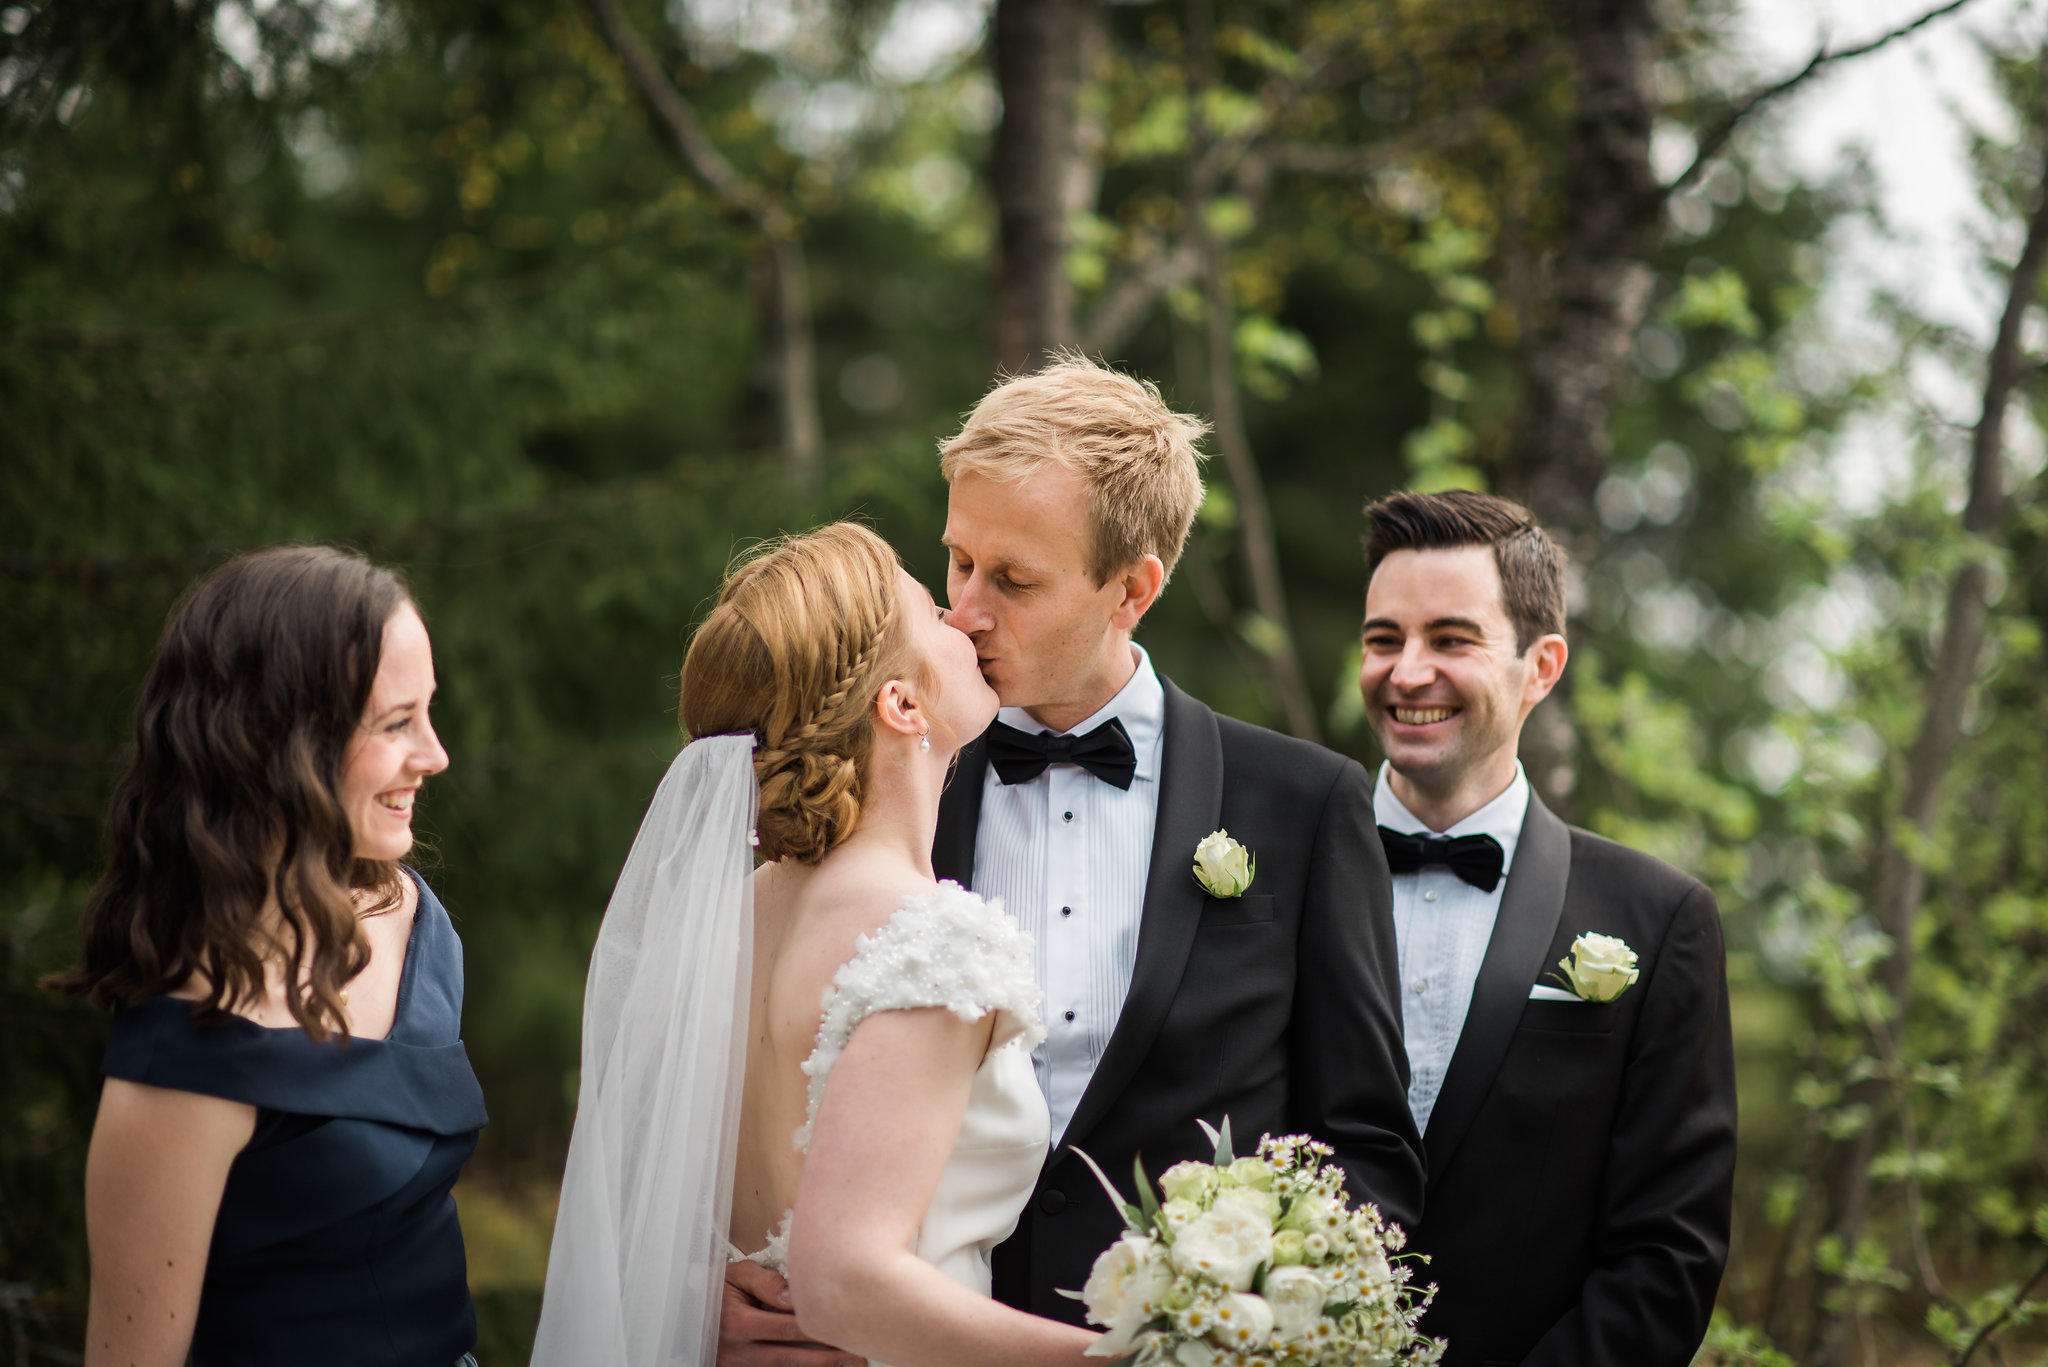 Pixlight-Bryllup-Nina-Thorbjorn103fotograf-holmekolen-oslo.jpg